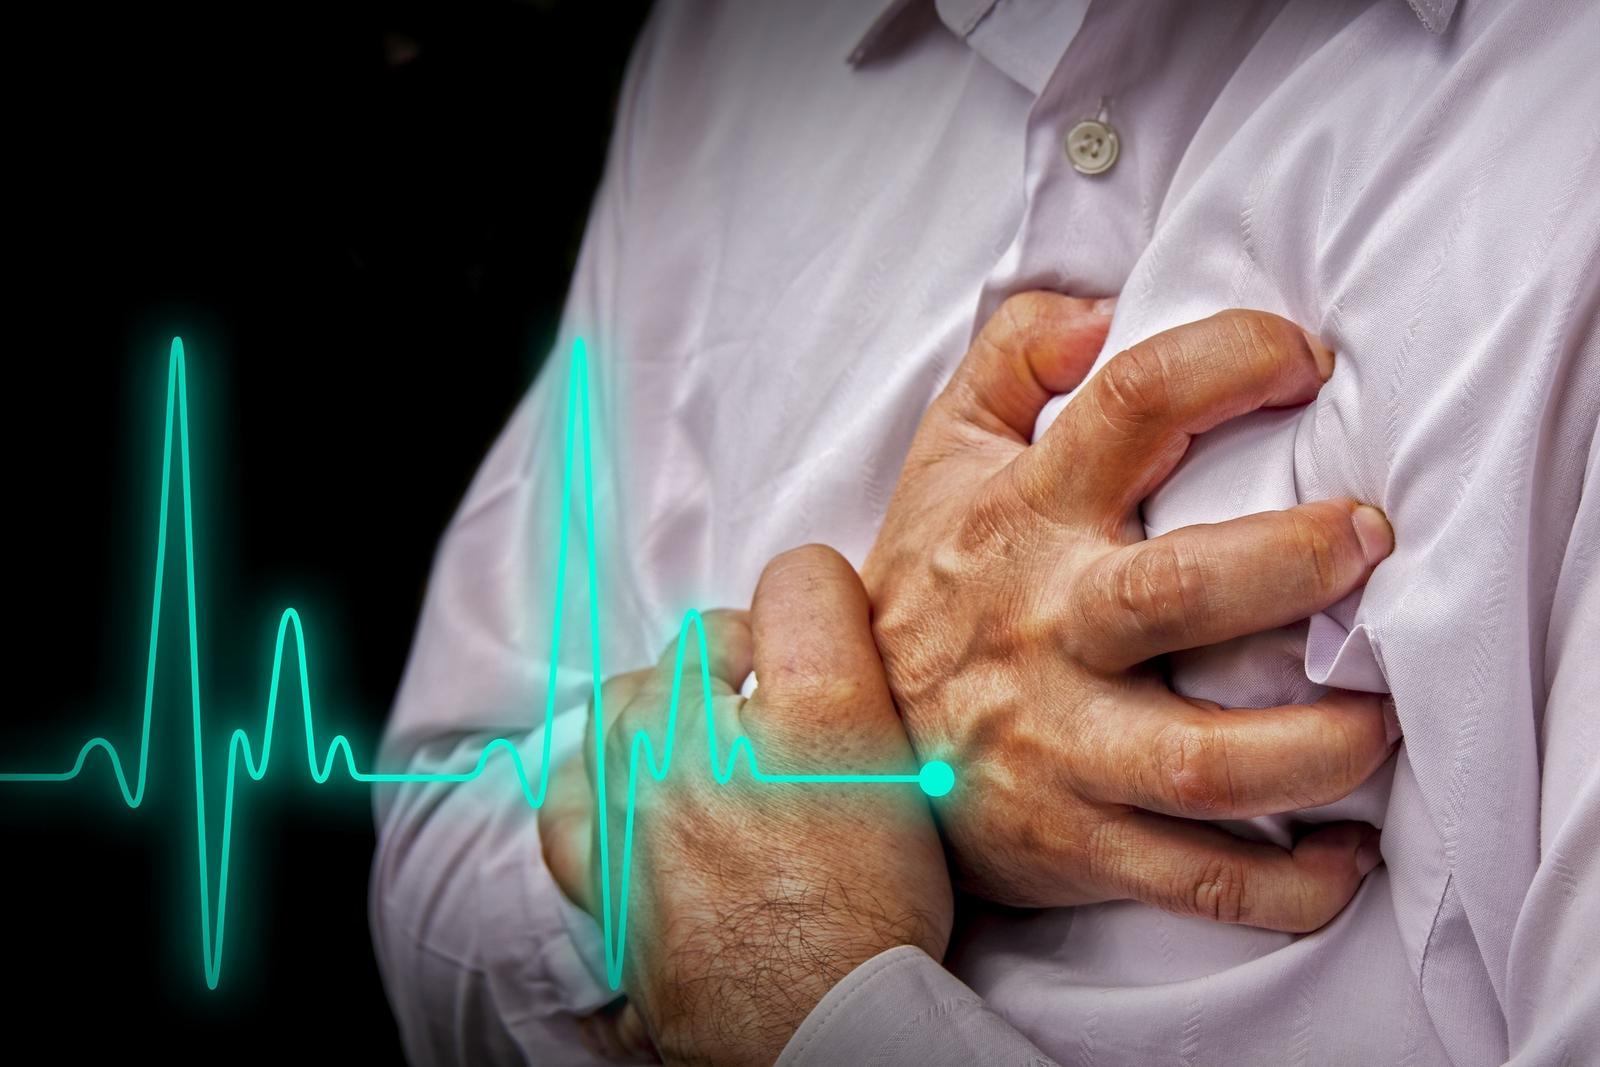 hipertenzija žiūrėti internete 2020 m)